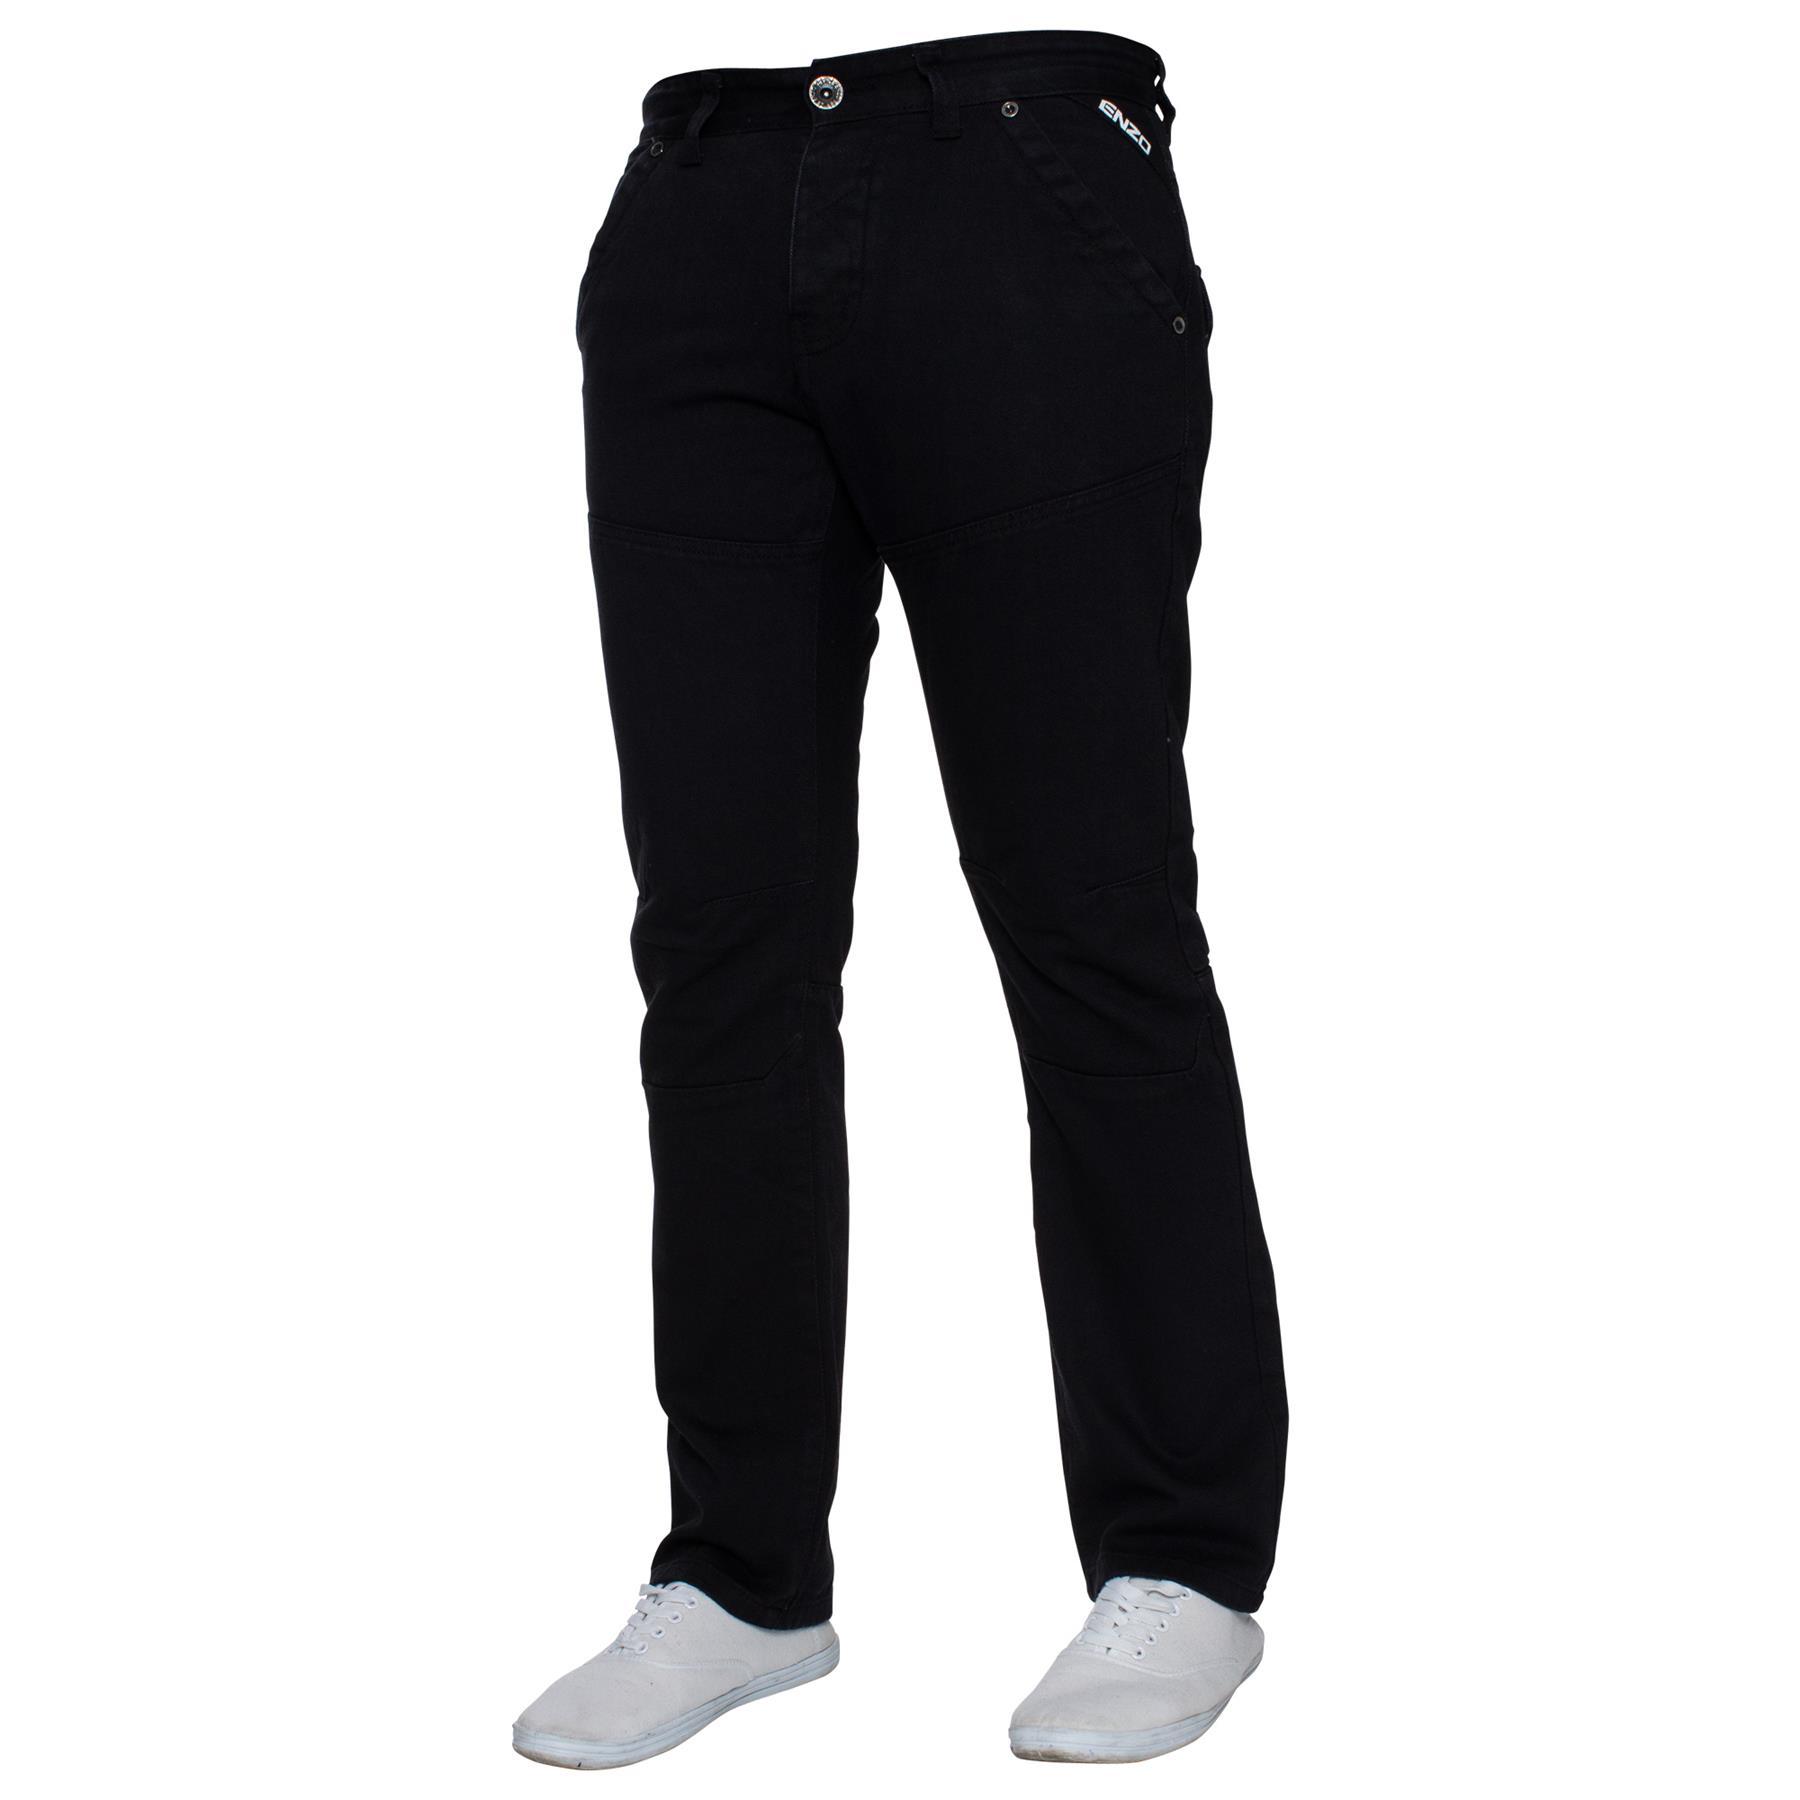 Enzo-Mens-Big-Tall-Jeans-Leg-King-Size-Denim-Pants-Chino-Trousers-Pants-44-034-60-034 thumbnail 51